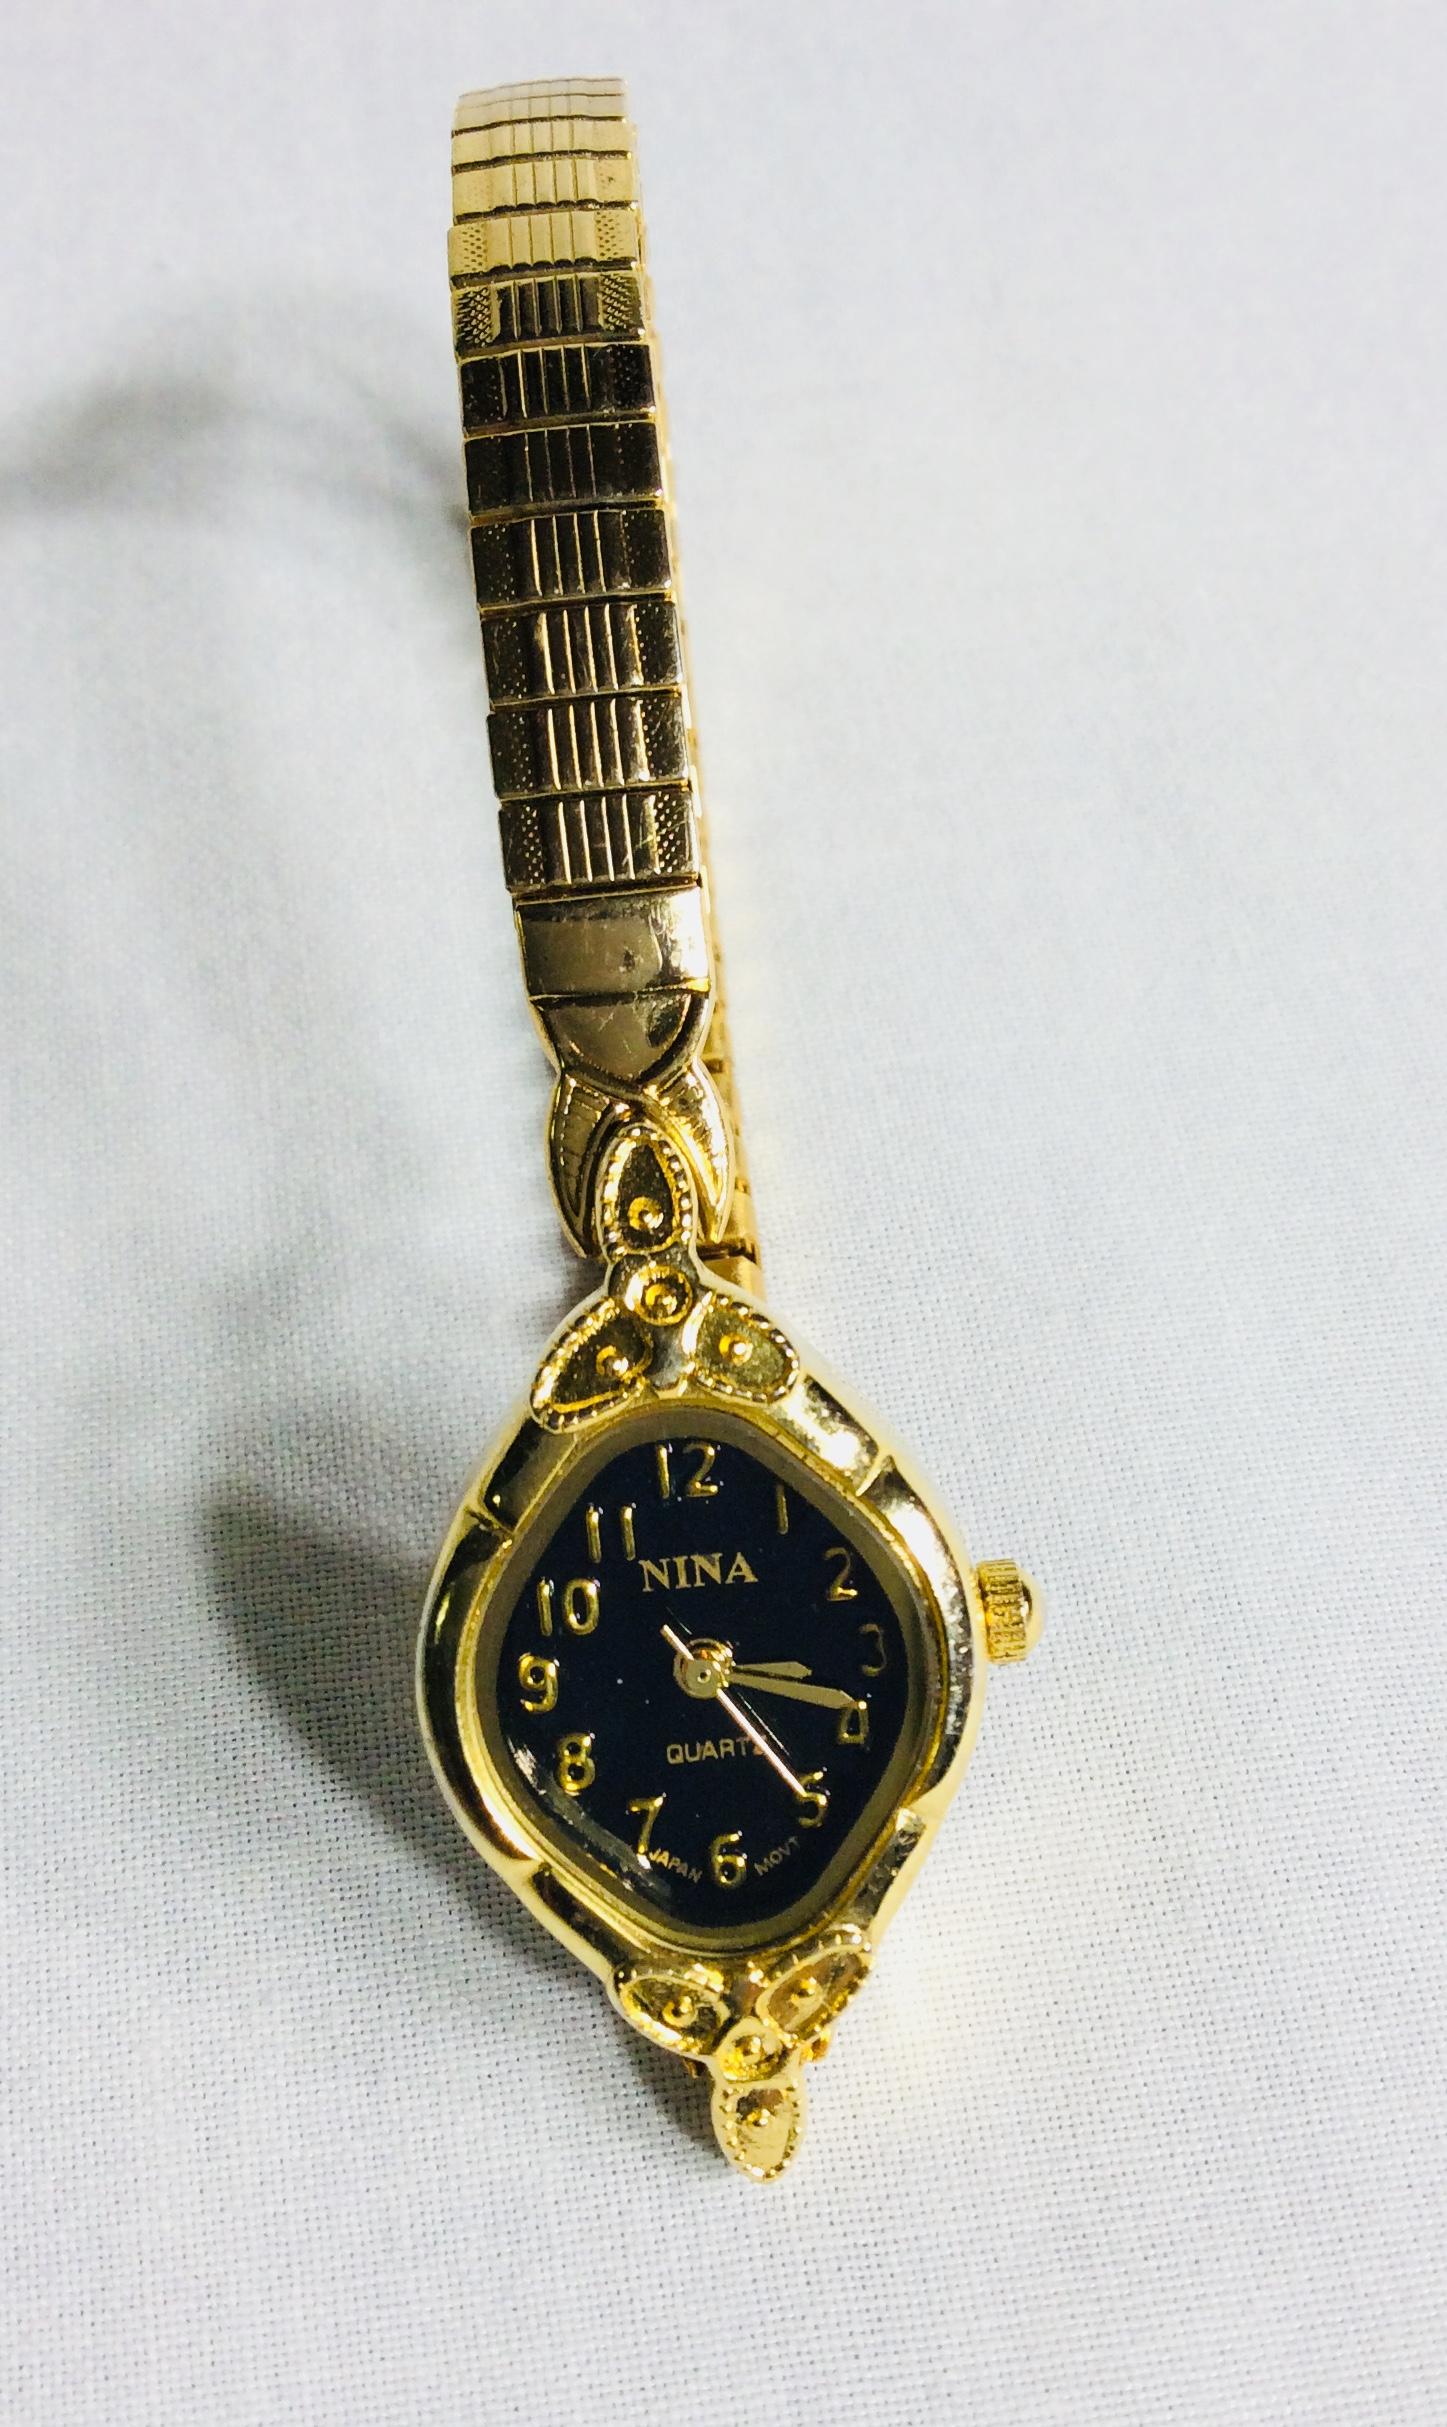 Nina gold watch